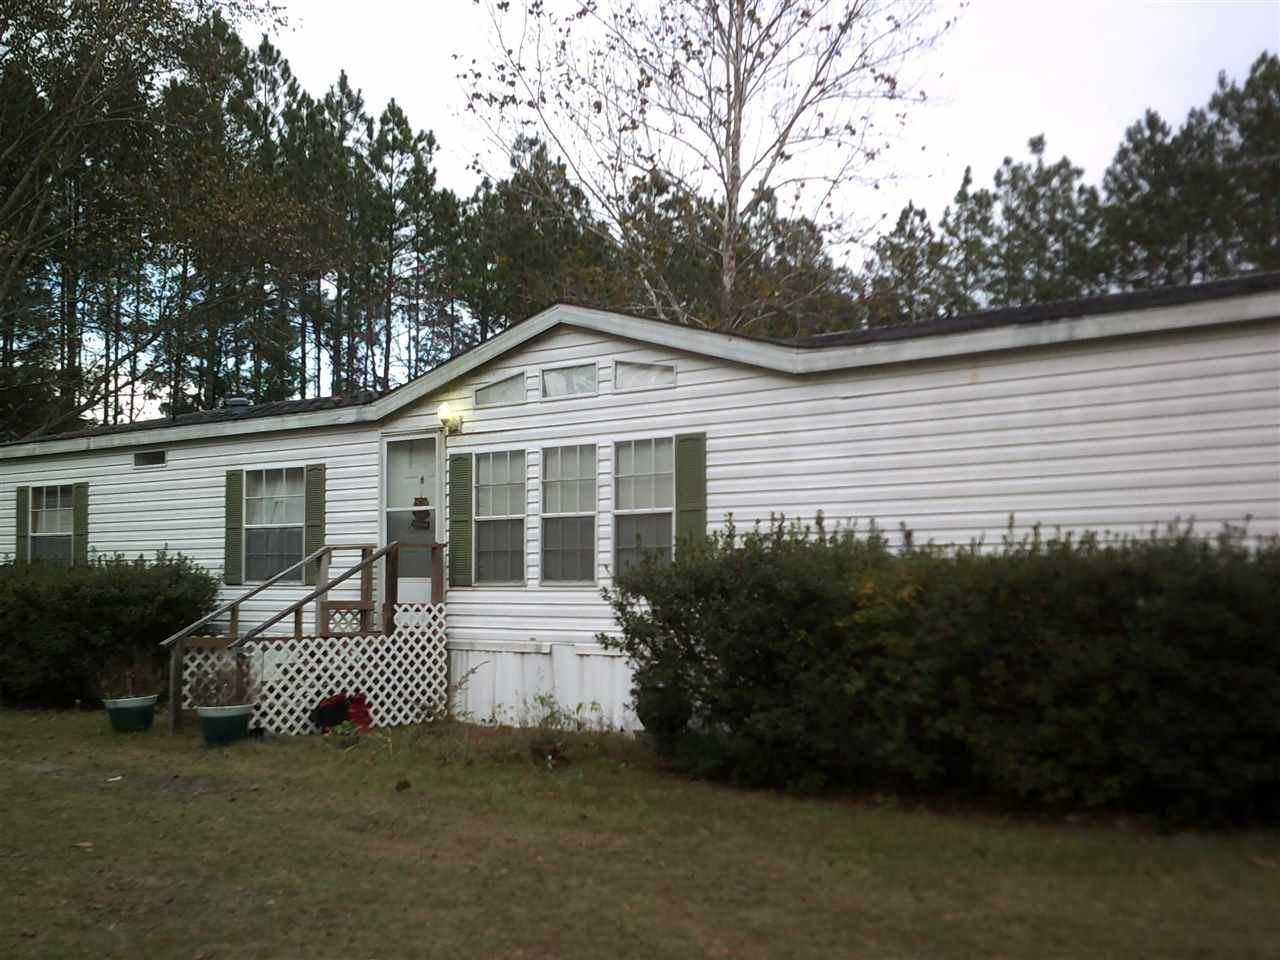 3980 Charles Sadler Lane, Perry, FL 32348 - MLS#: 301861